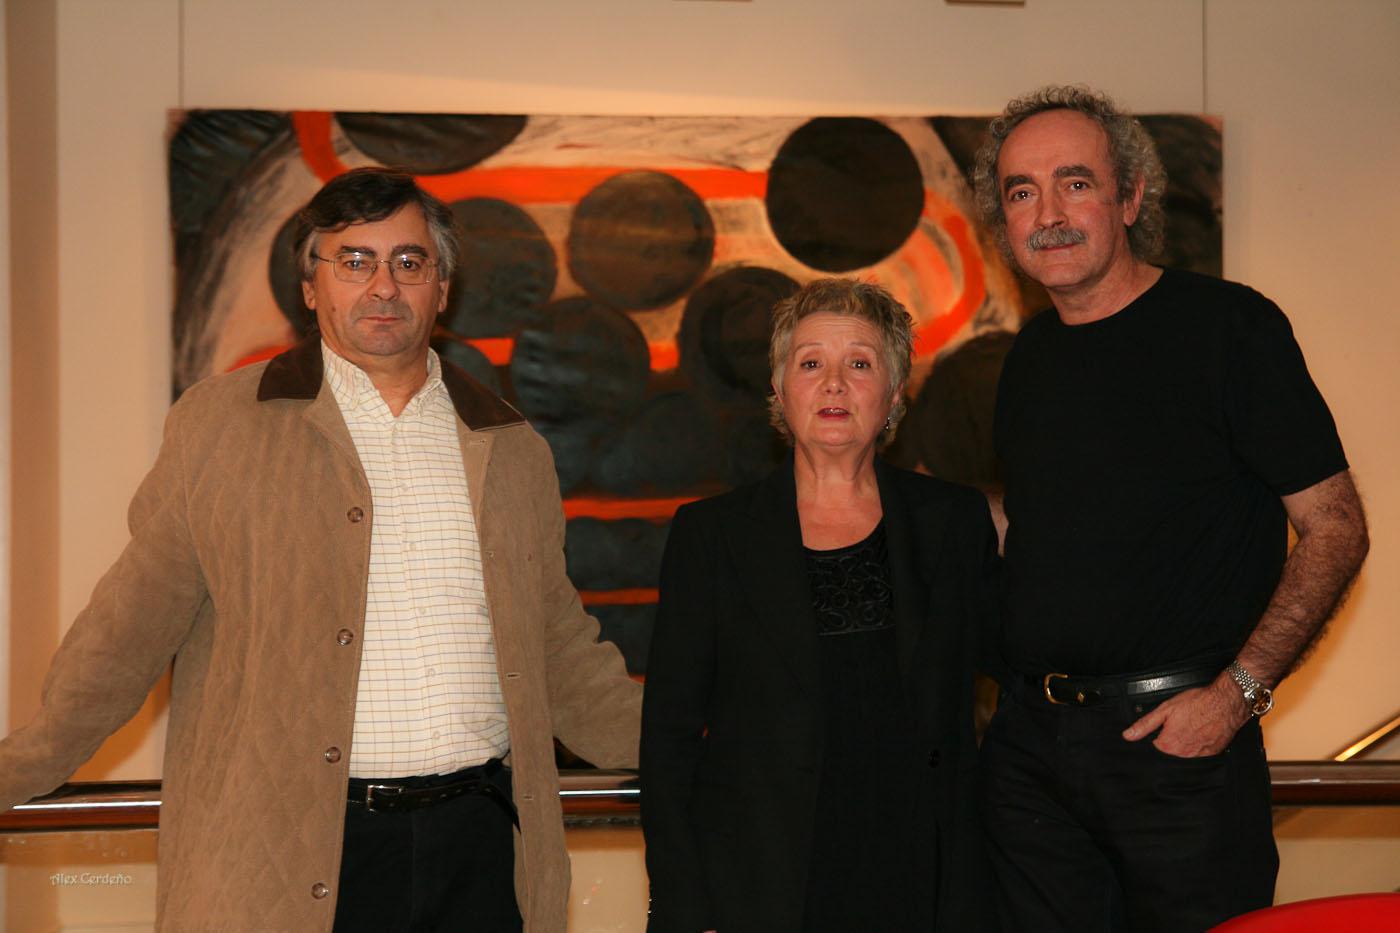 Ines Medina, Koldo Etxebarria, y Alex Cerdeño,